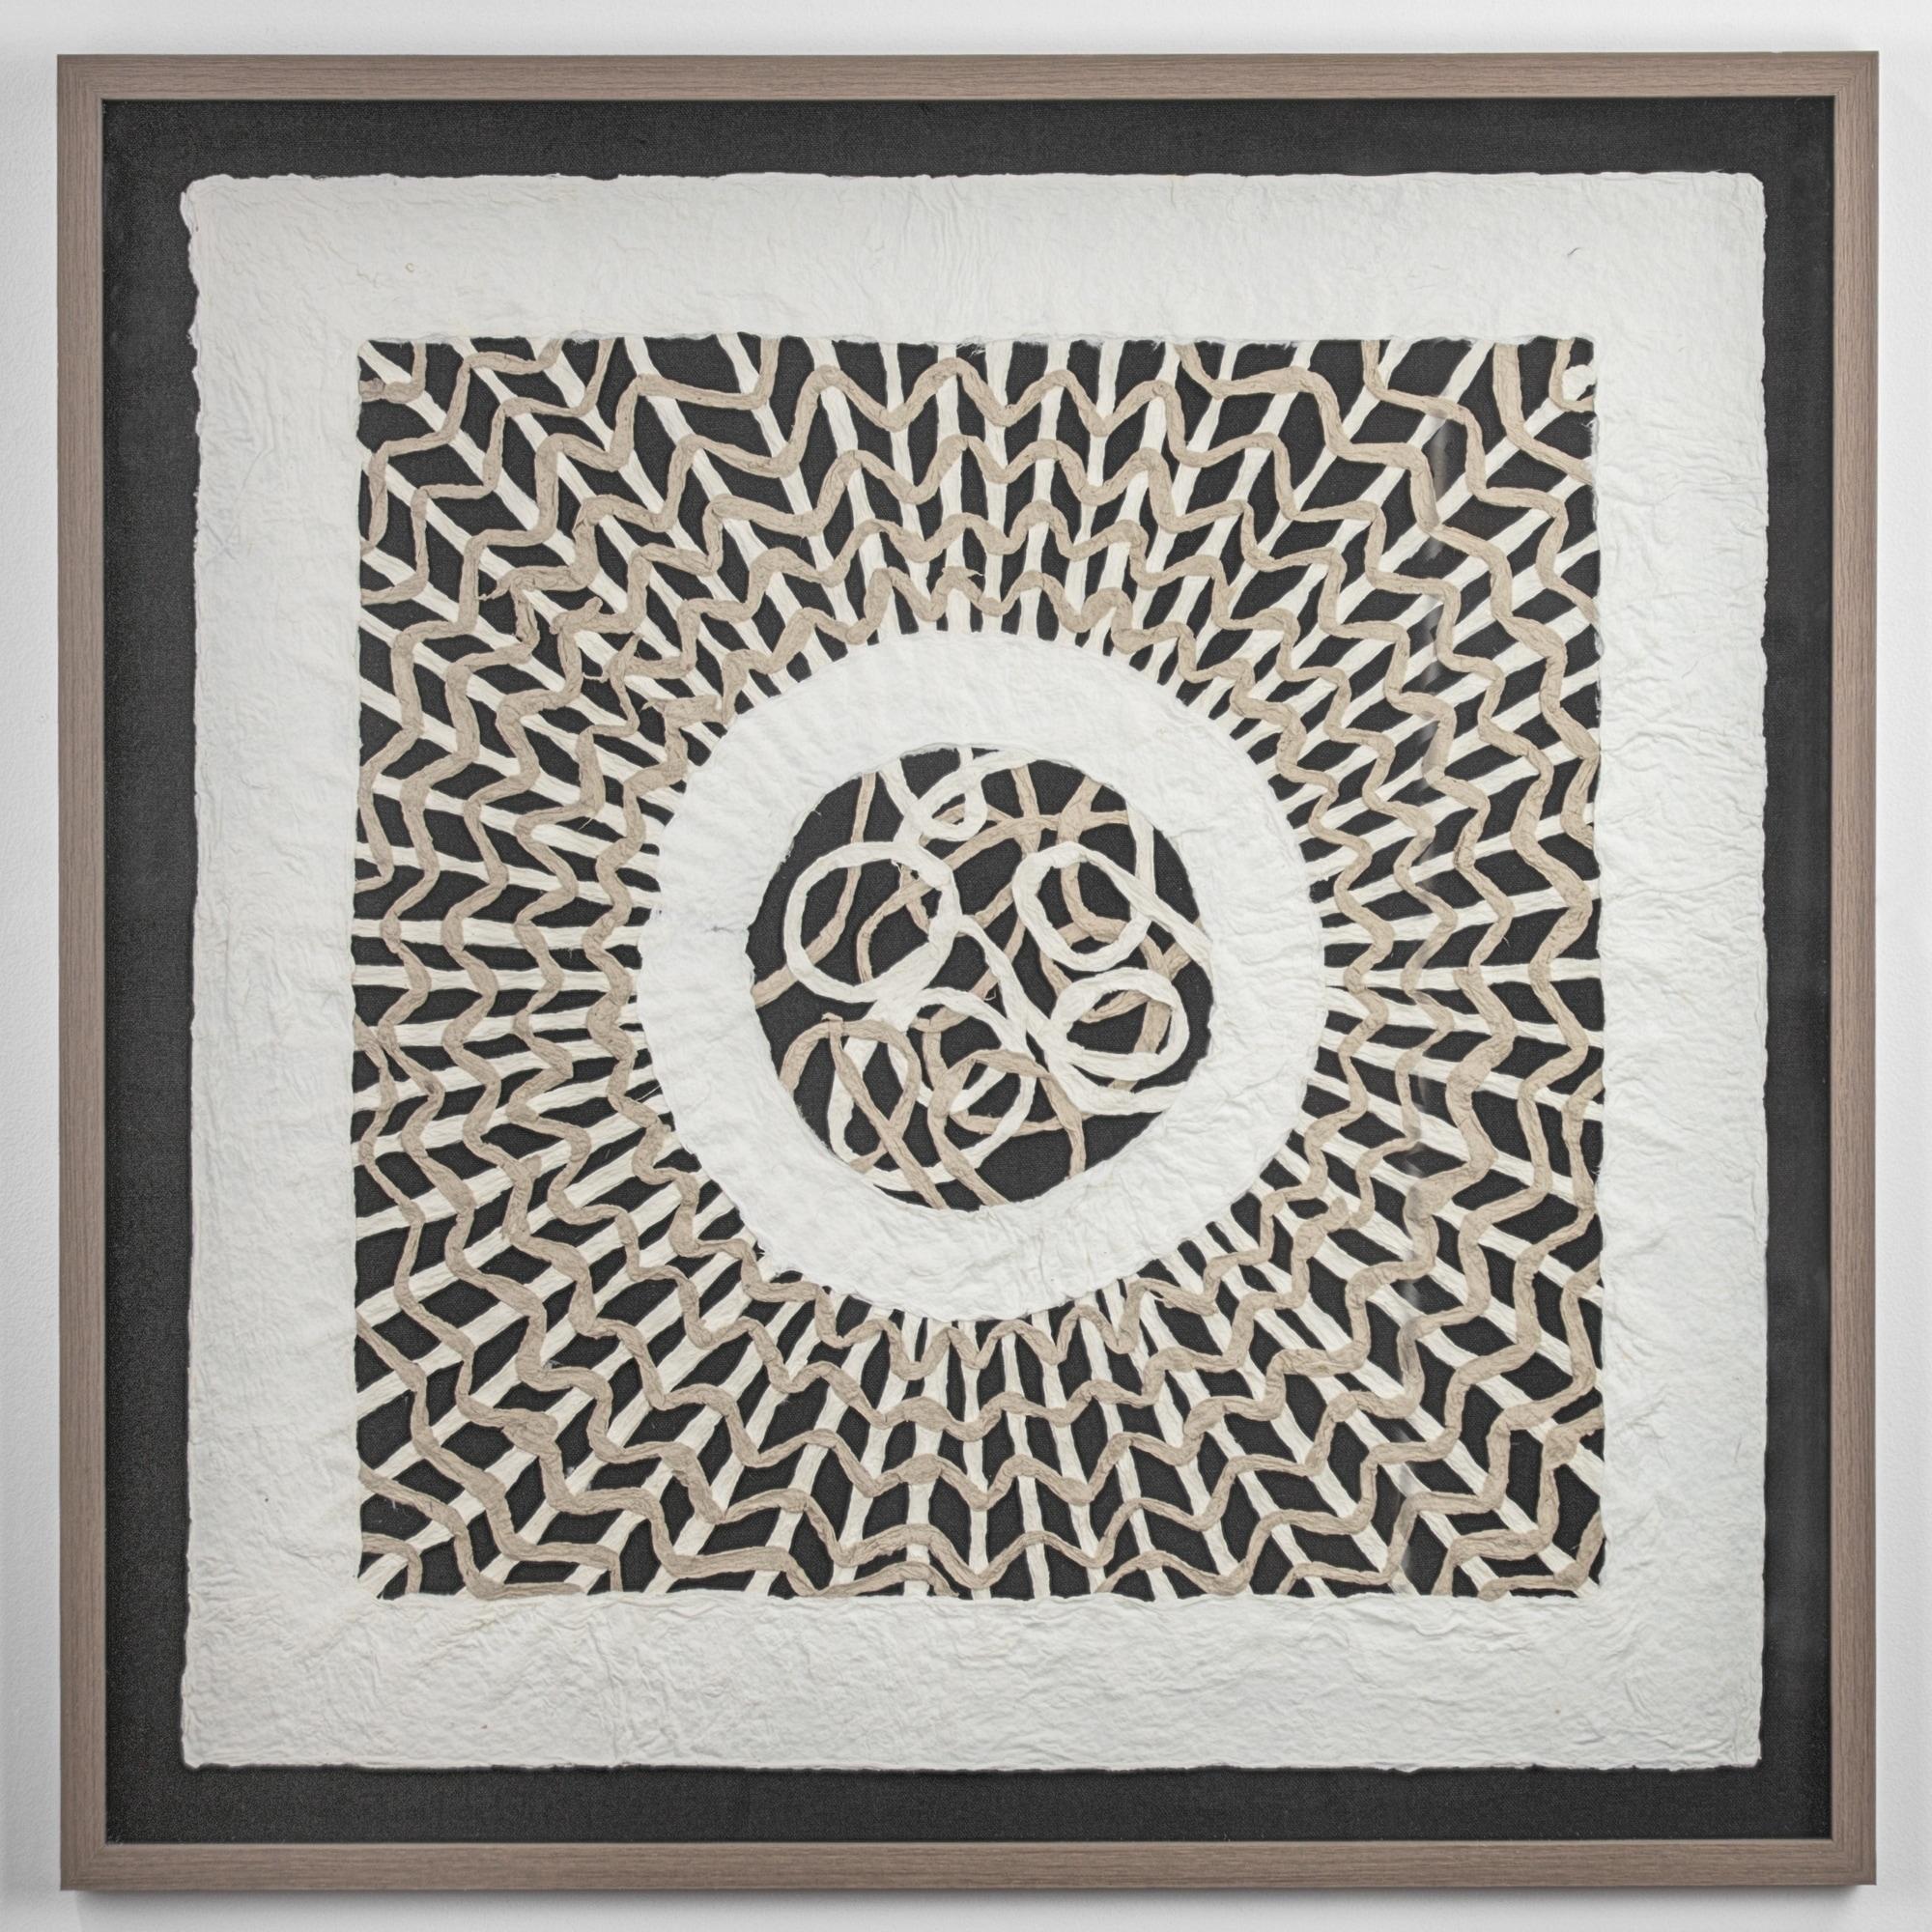 Handmade Rice Paper Wall Art 31 X 31 On Sale Overstock 29141447